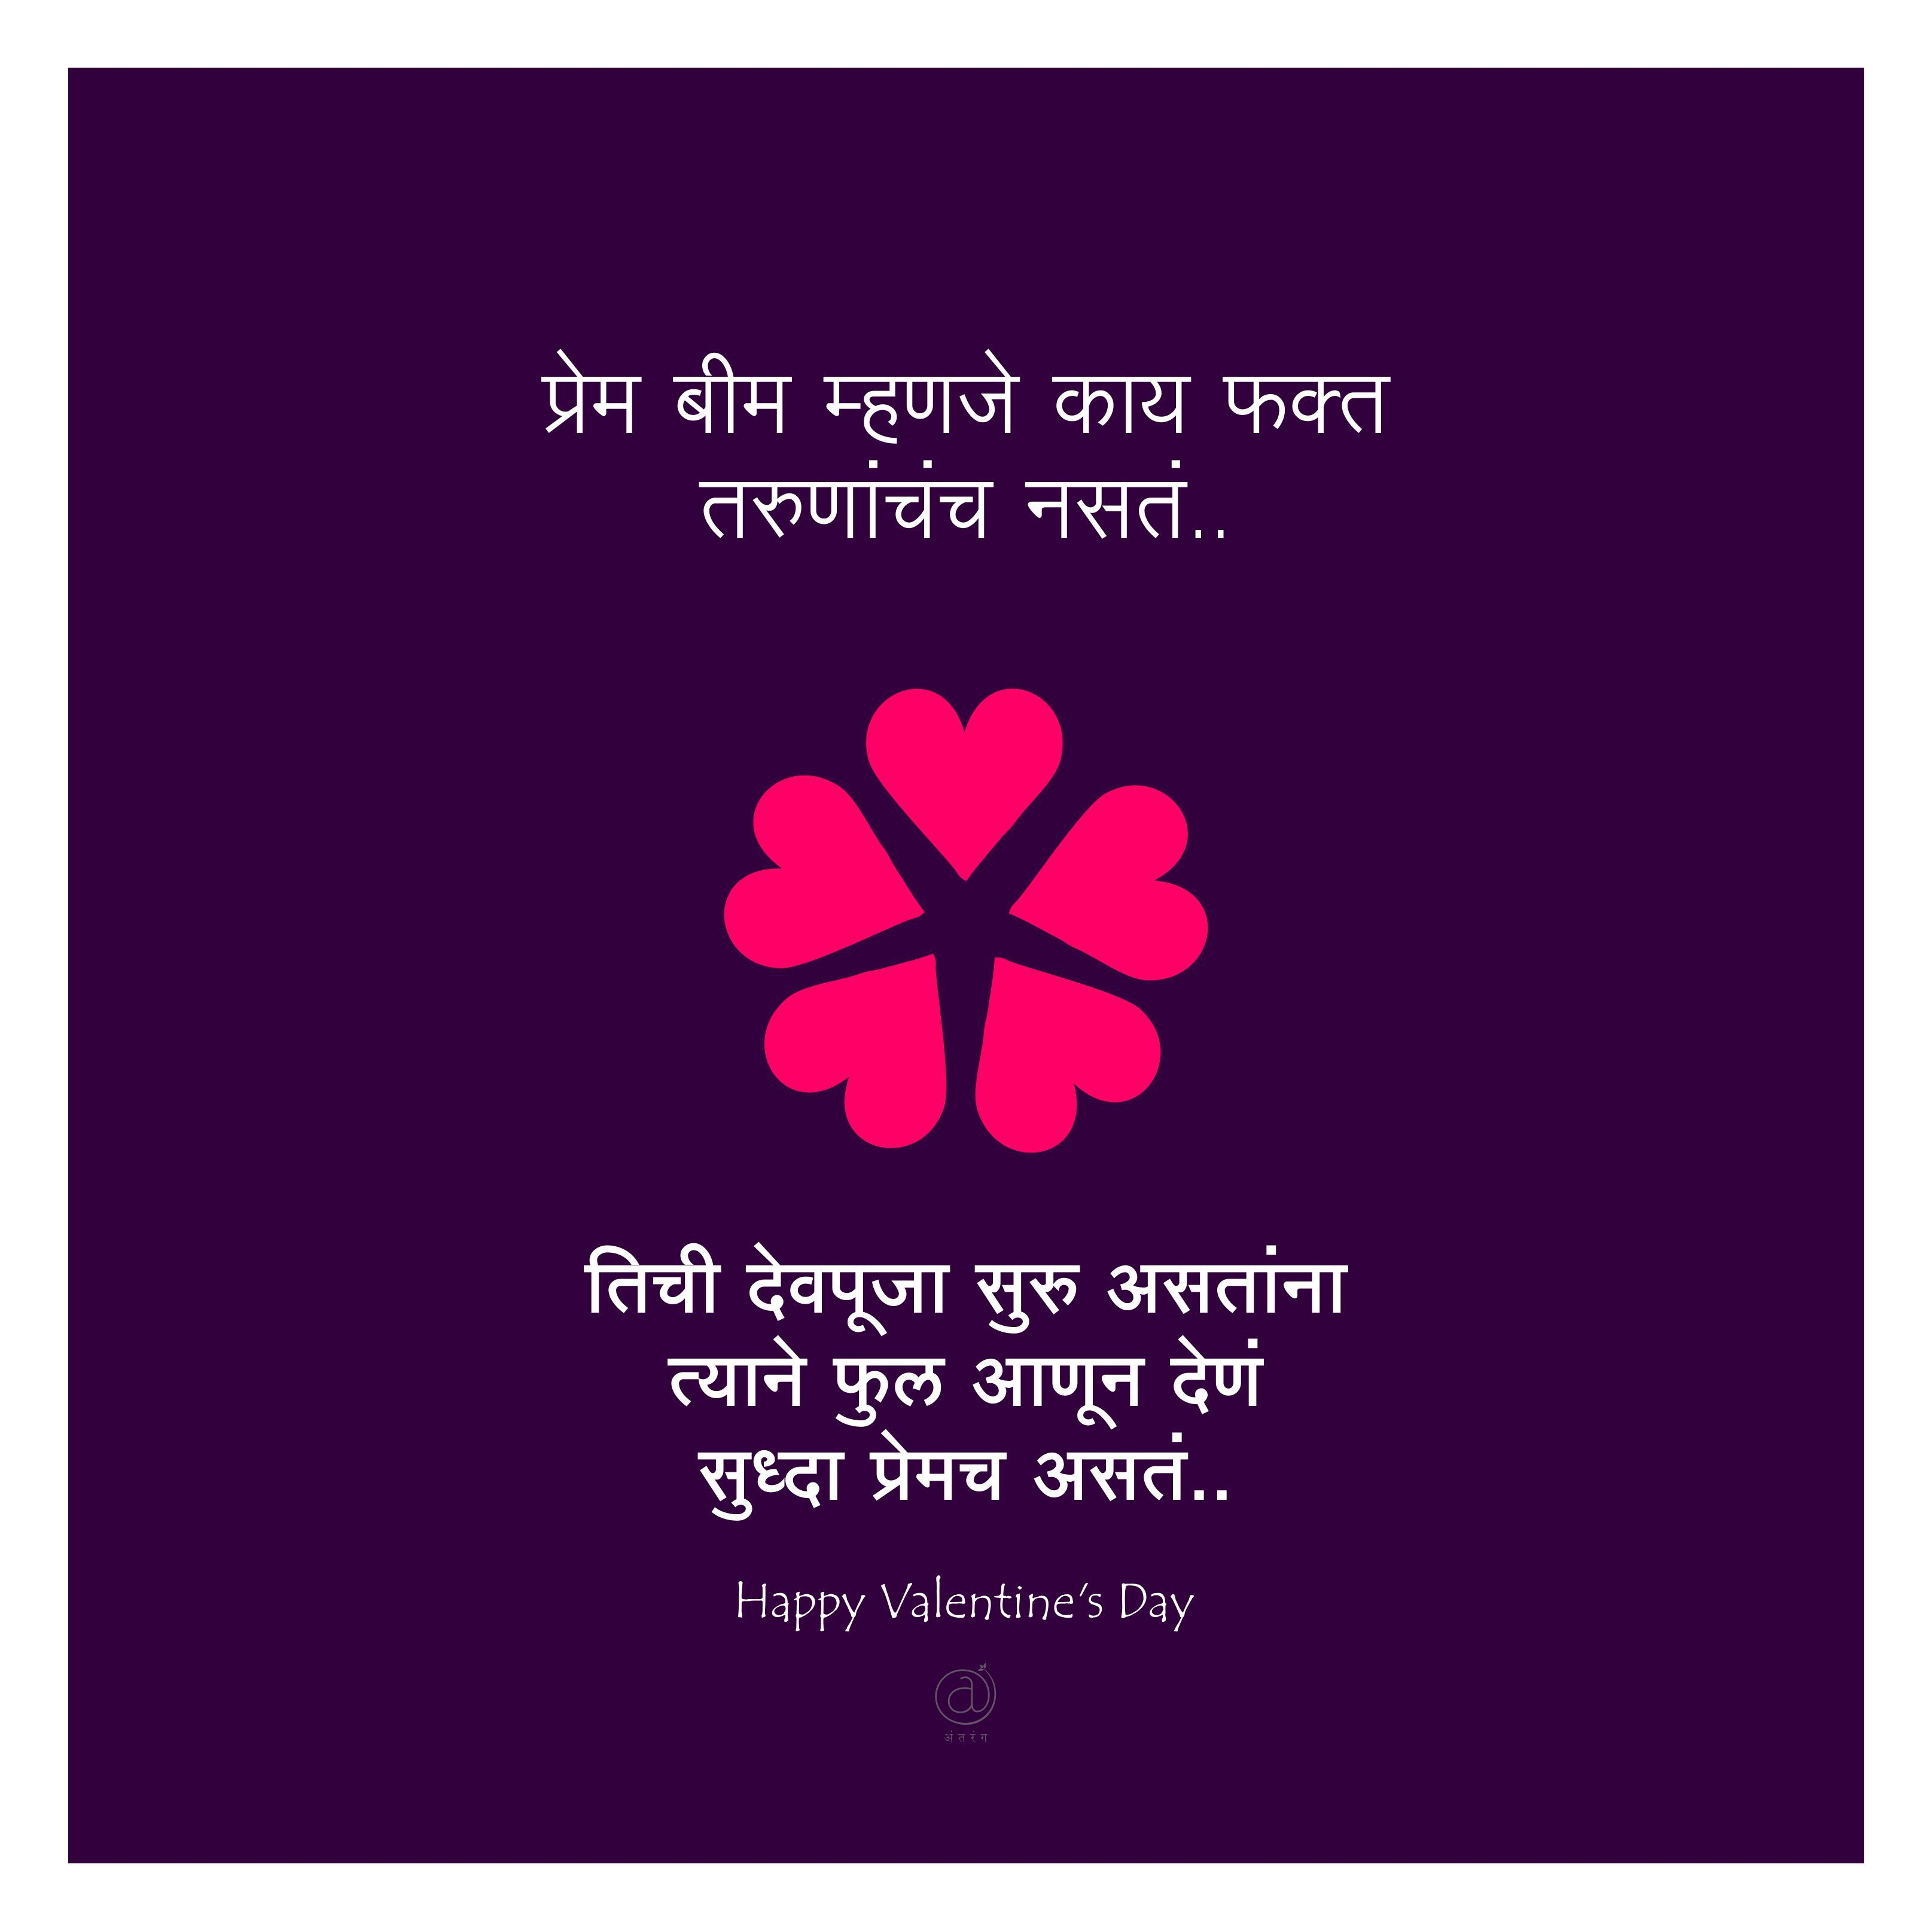 Pin By Ankush Bordekar On Marathi Quotes Happy Anniversary Quotes Anniversary Quotes For Couple Adorable Quotes